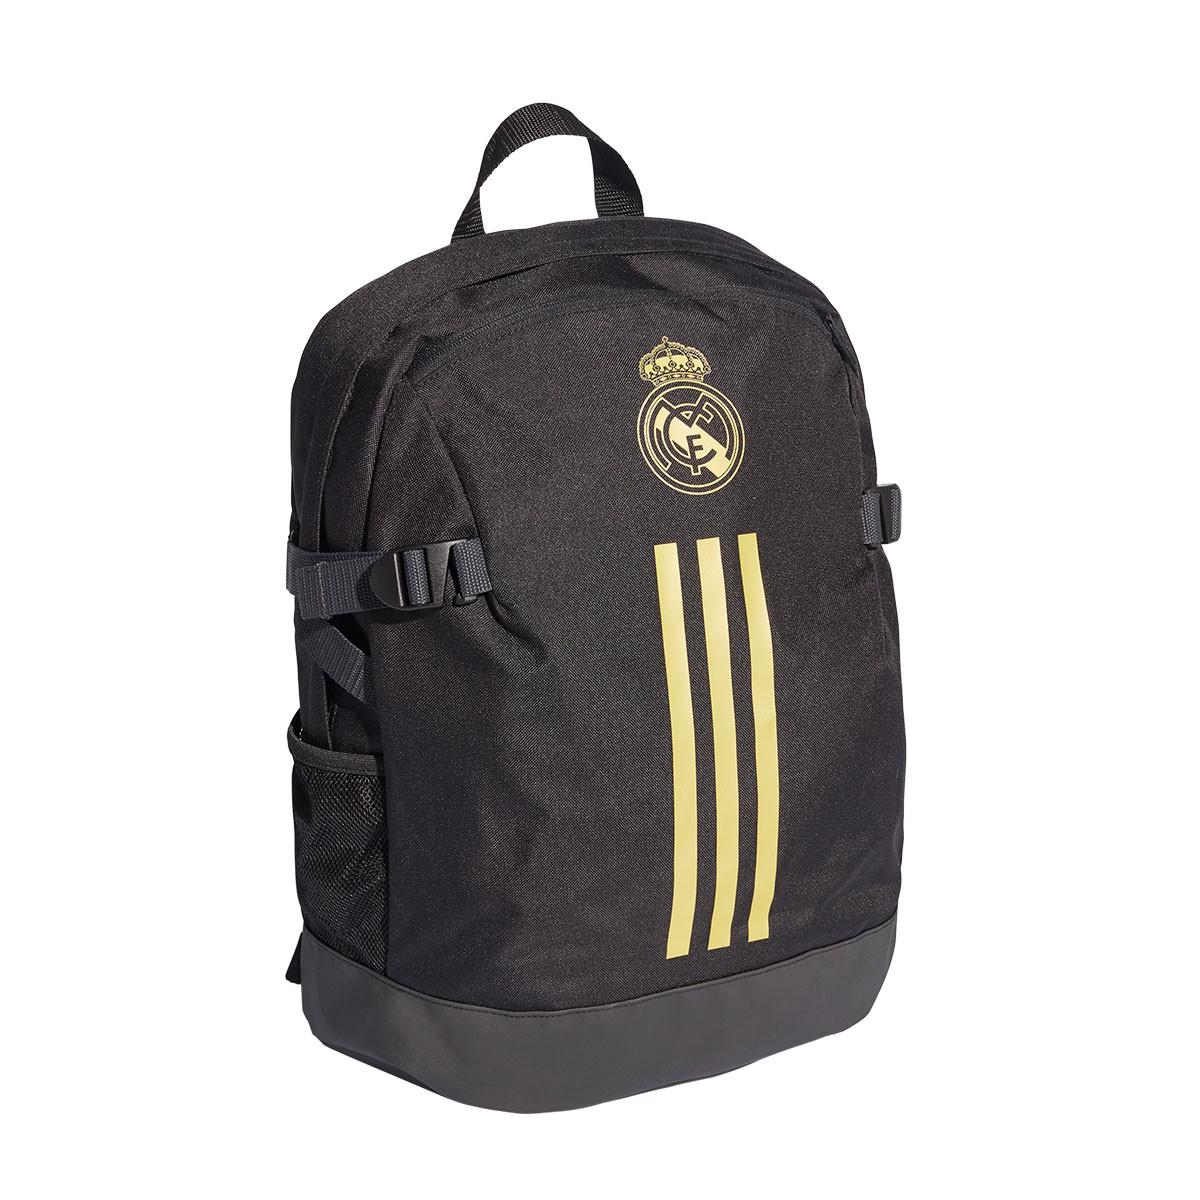 e8b2236dd Backpack adidas Real Madrid BP 2019-2020 Black-Dark football gold ...